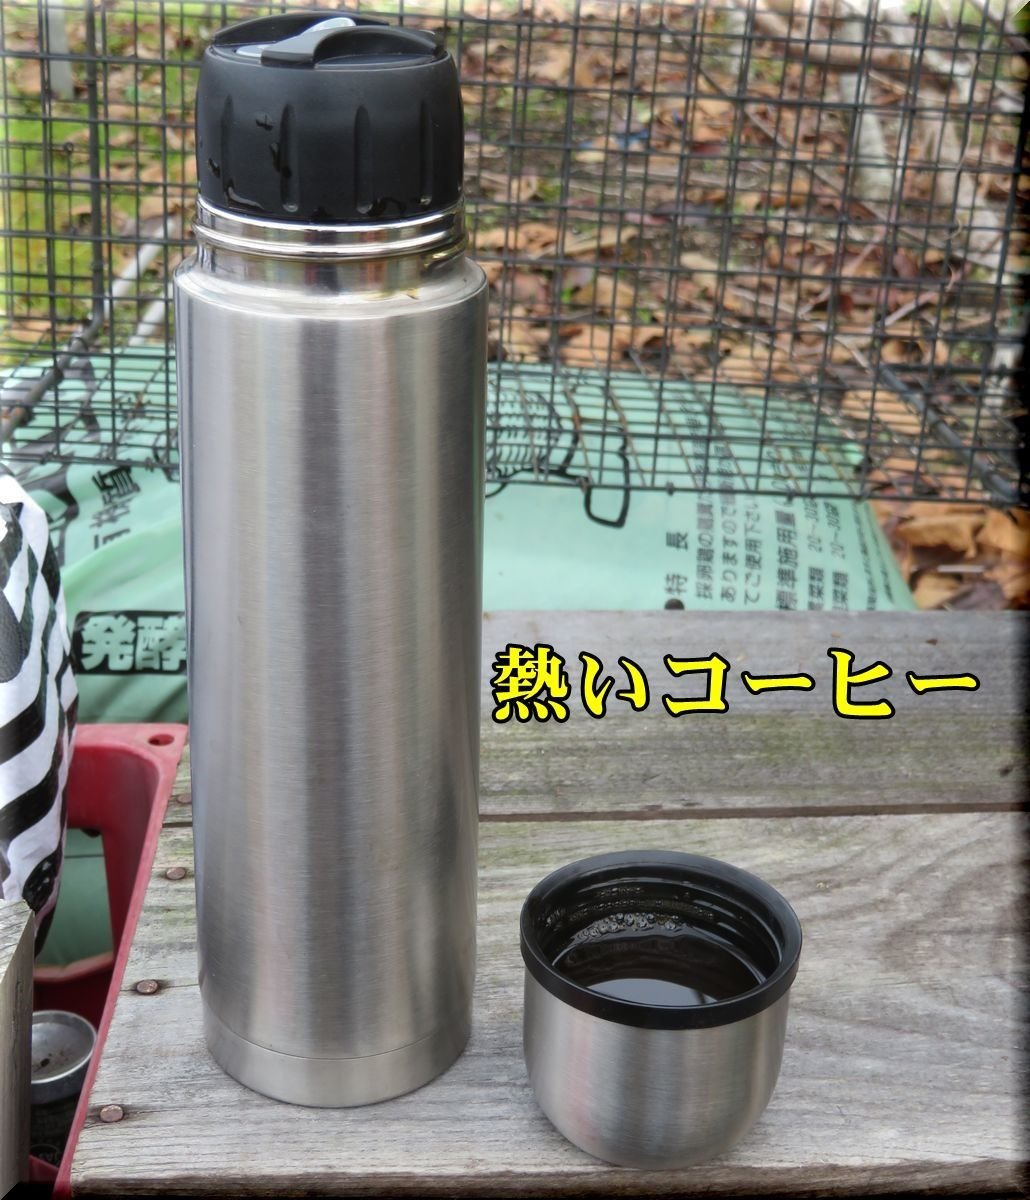 1cafee171208_006.jpg